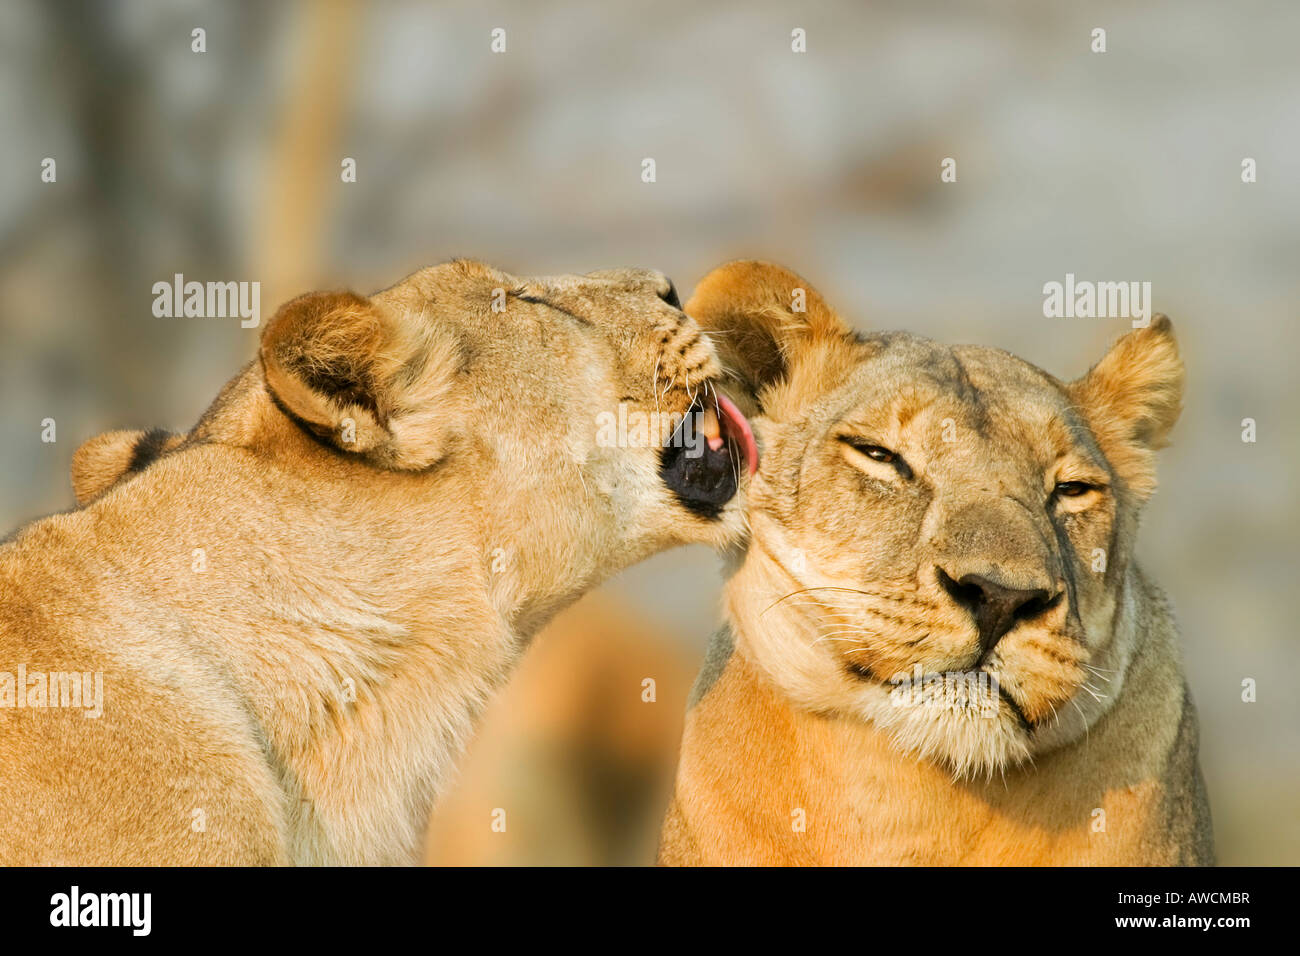 Lionesses (Panthera leo) are licking one another, Savuti, Chobe national park, Botswana, Africa Stock Photo